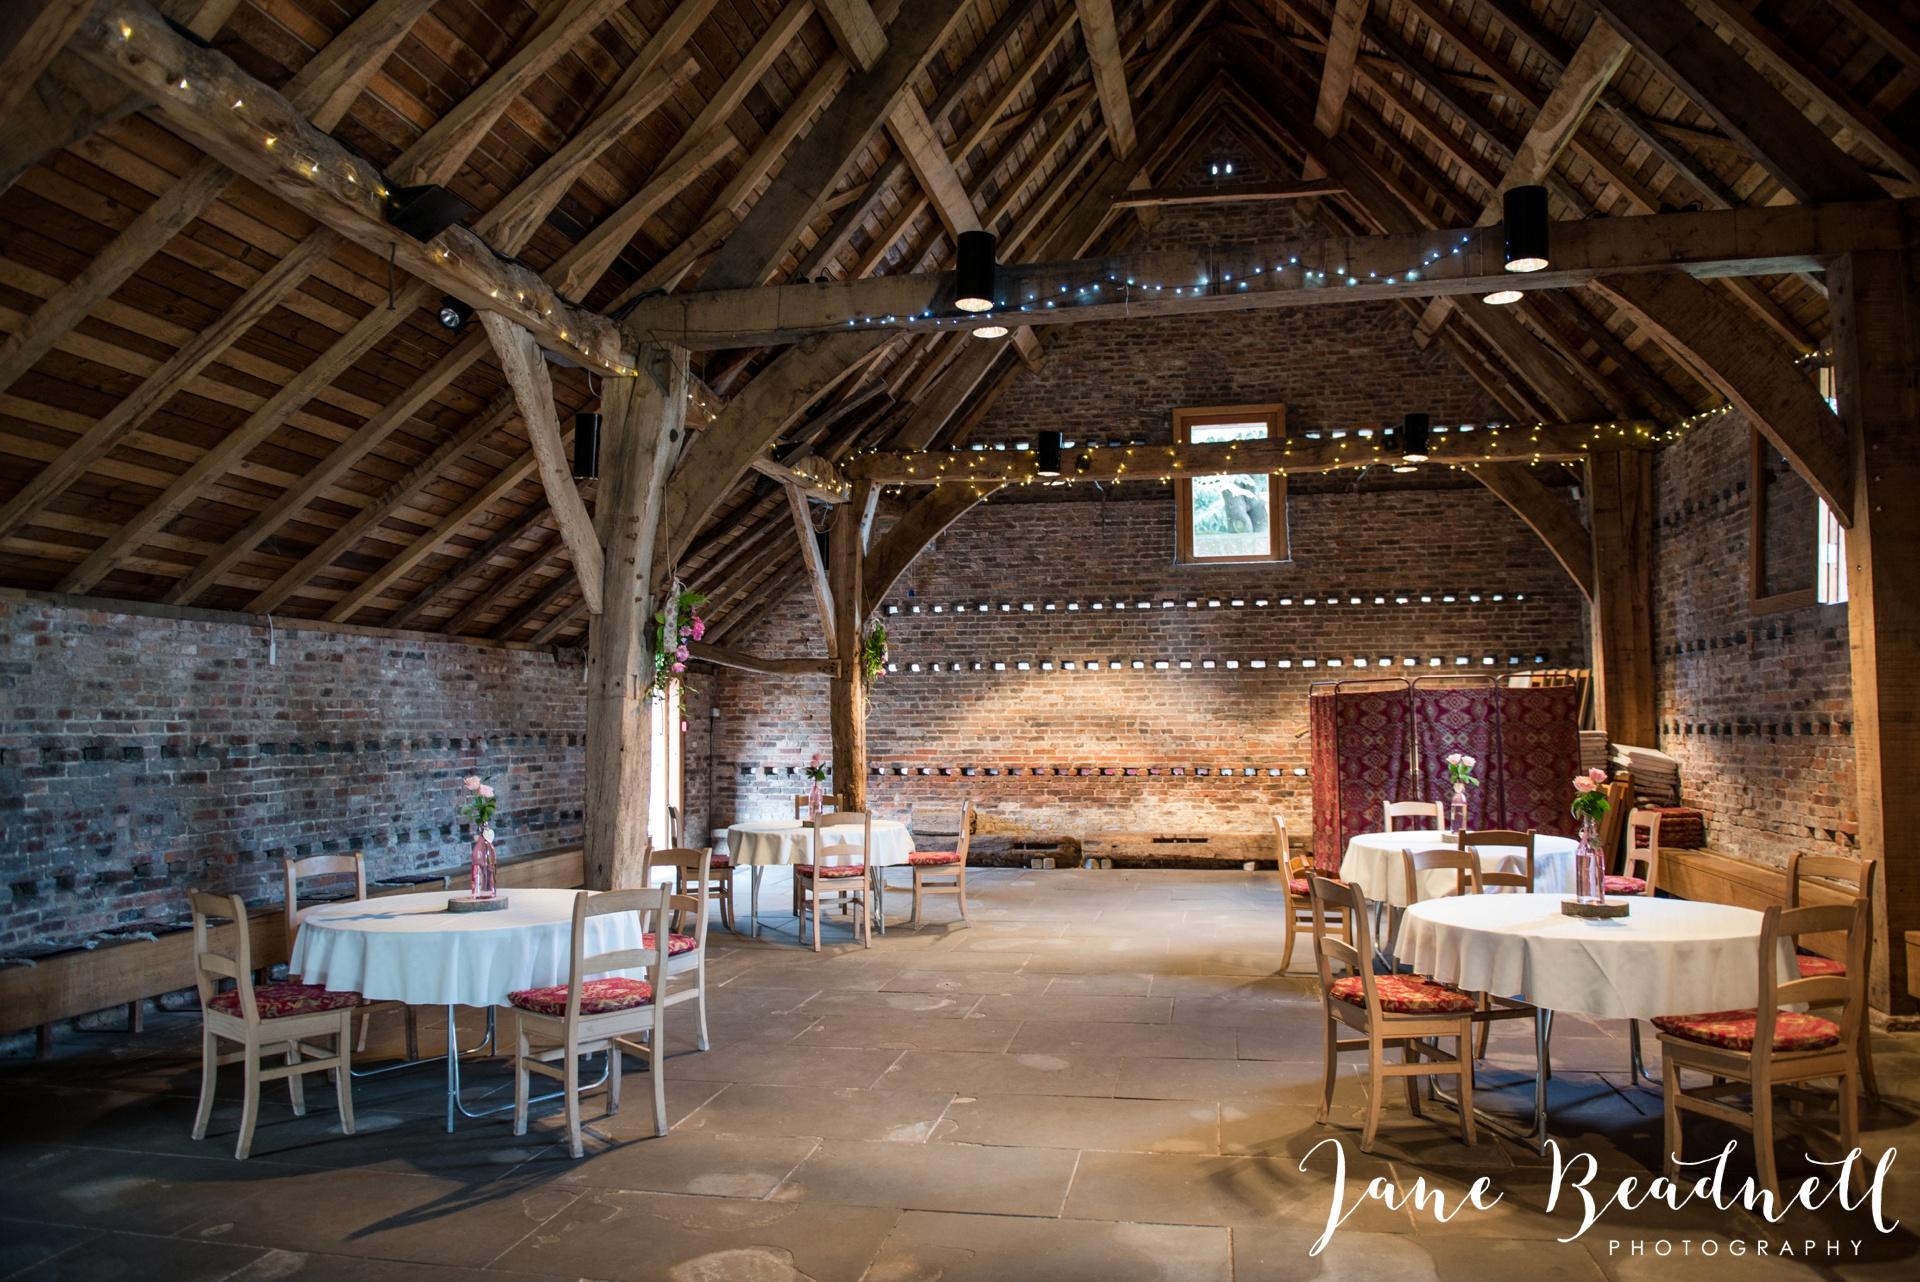 yorkshire-fine-art-wedding-photographer-jane-beadnell-photography-poppleton-york_0065